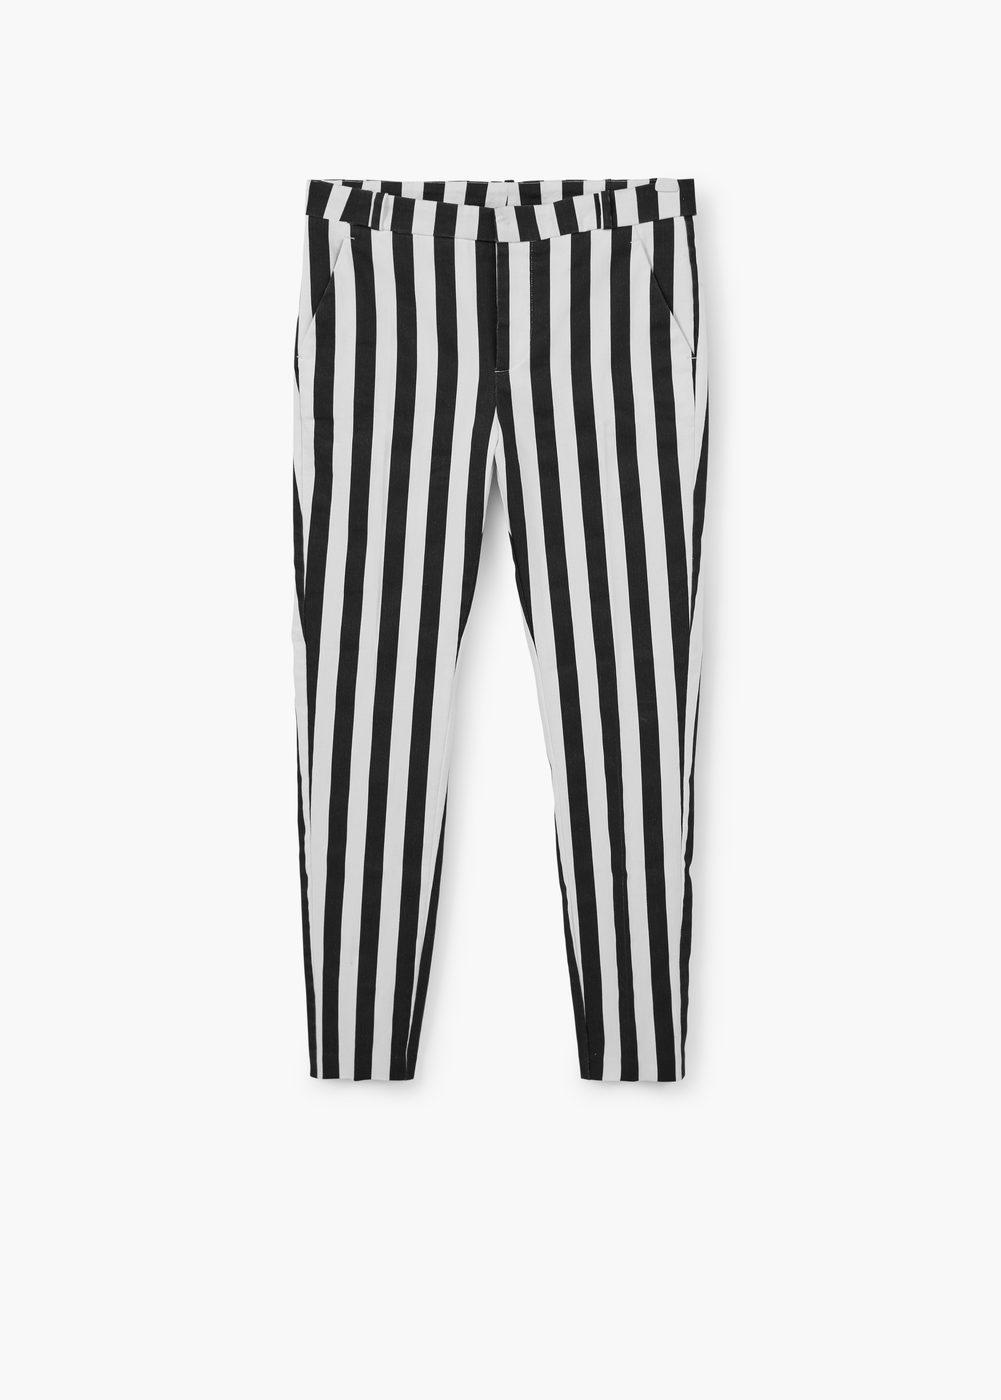 dirt cheap Clearance sale cheaper Striped cotton trousers - Women | MANGO